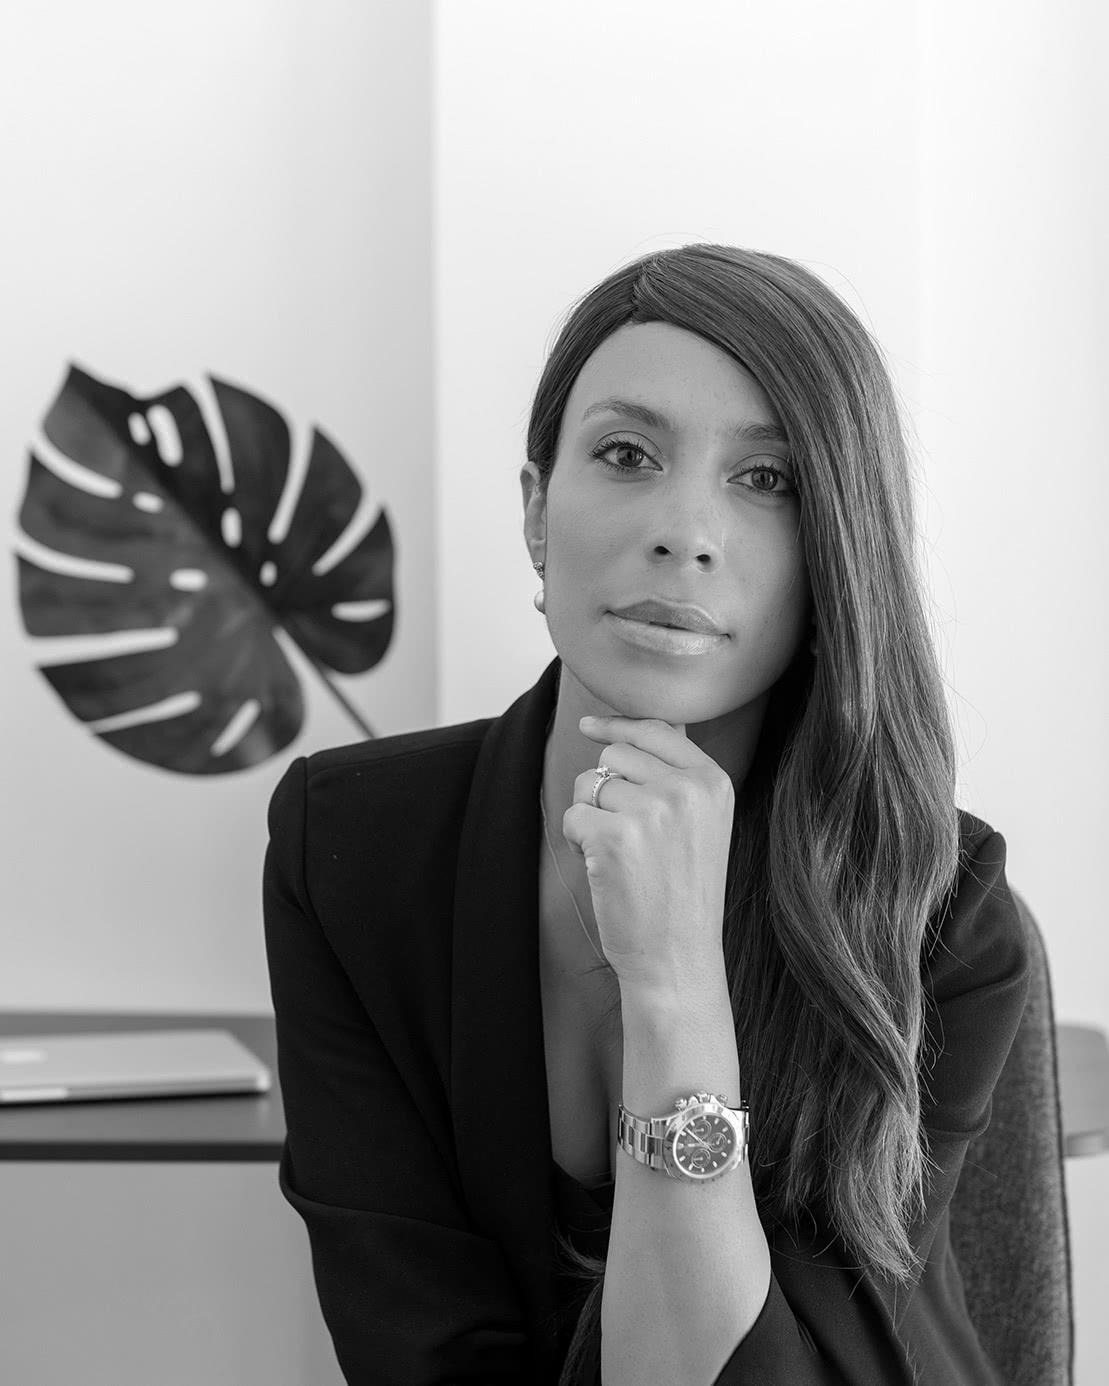 Florine E. Beauloye - Luxe Digital Editor in Chief